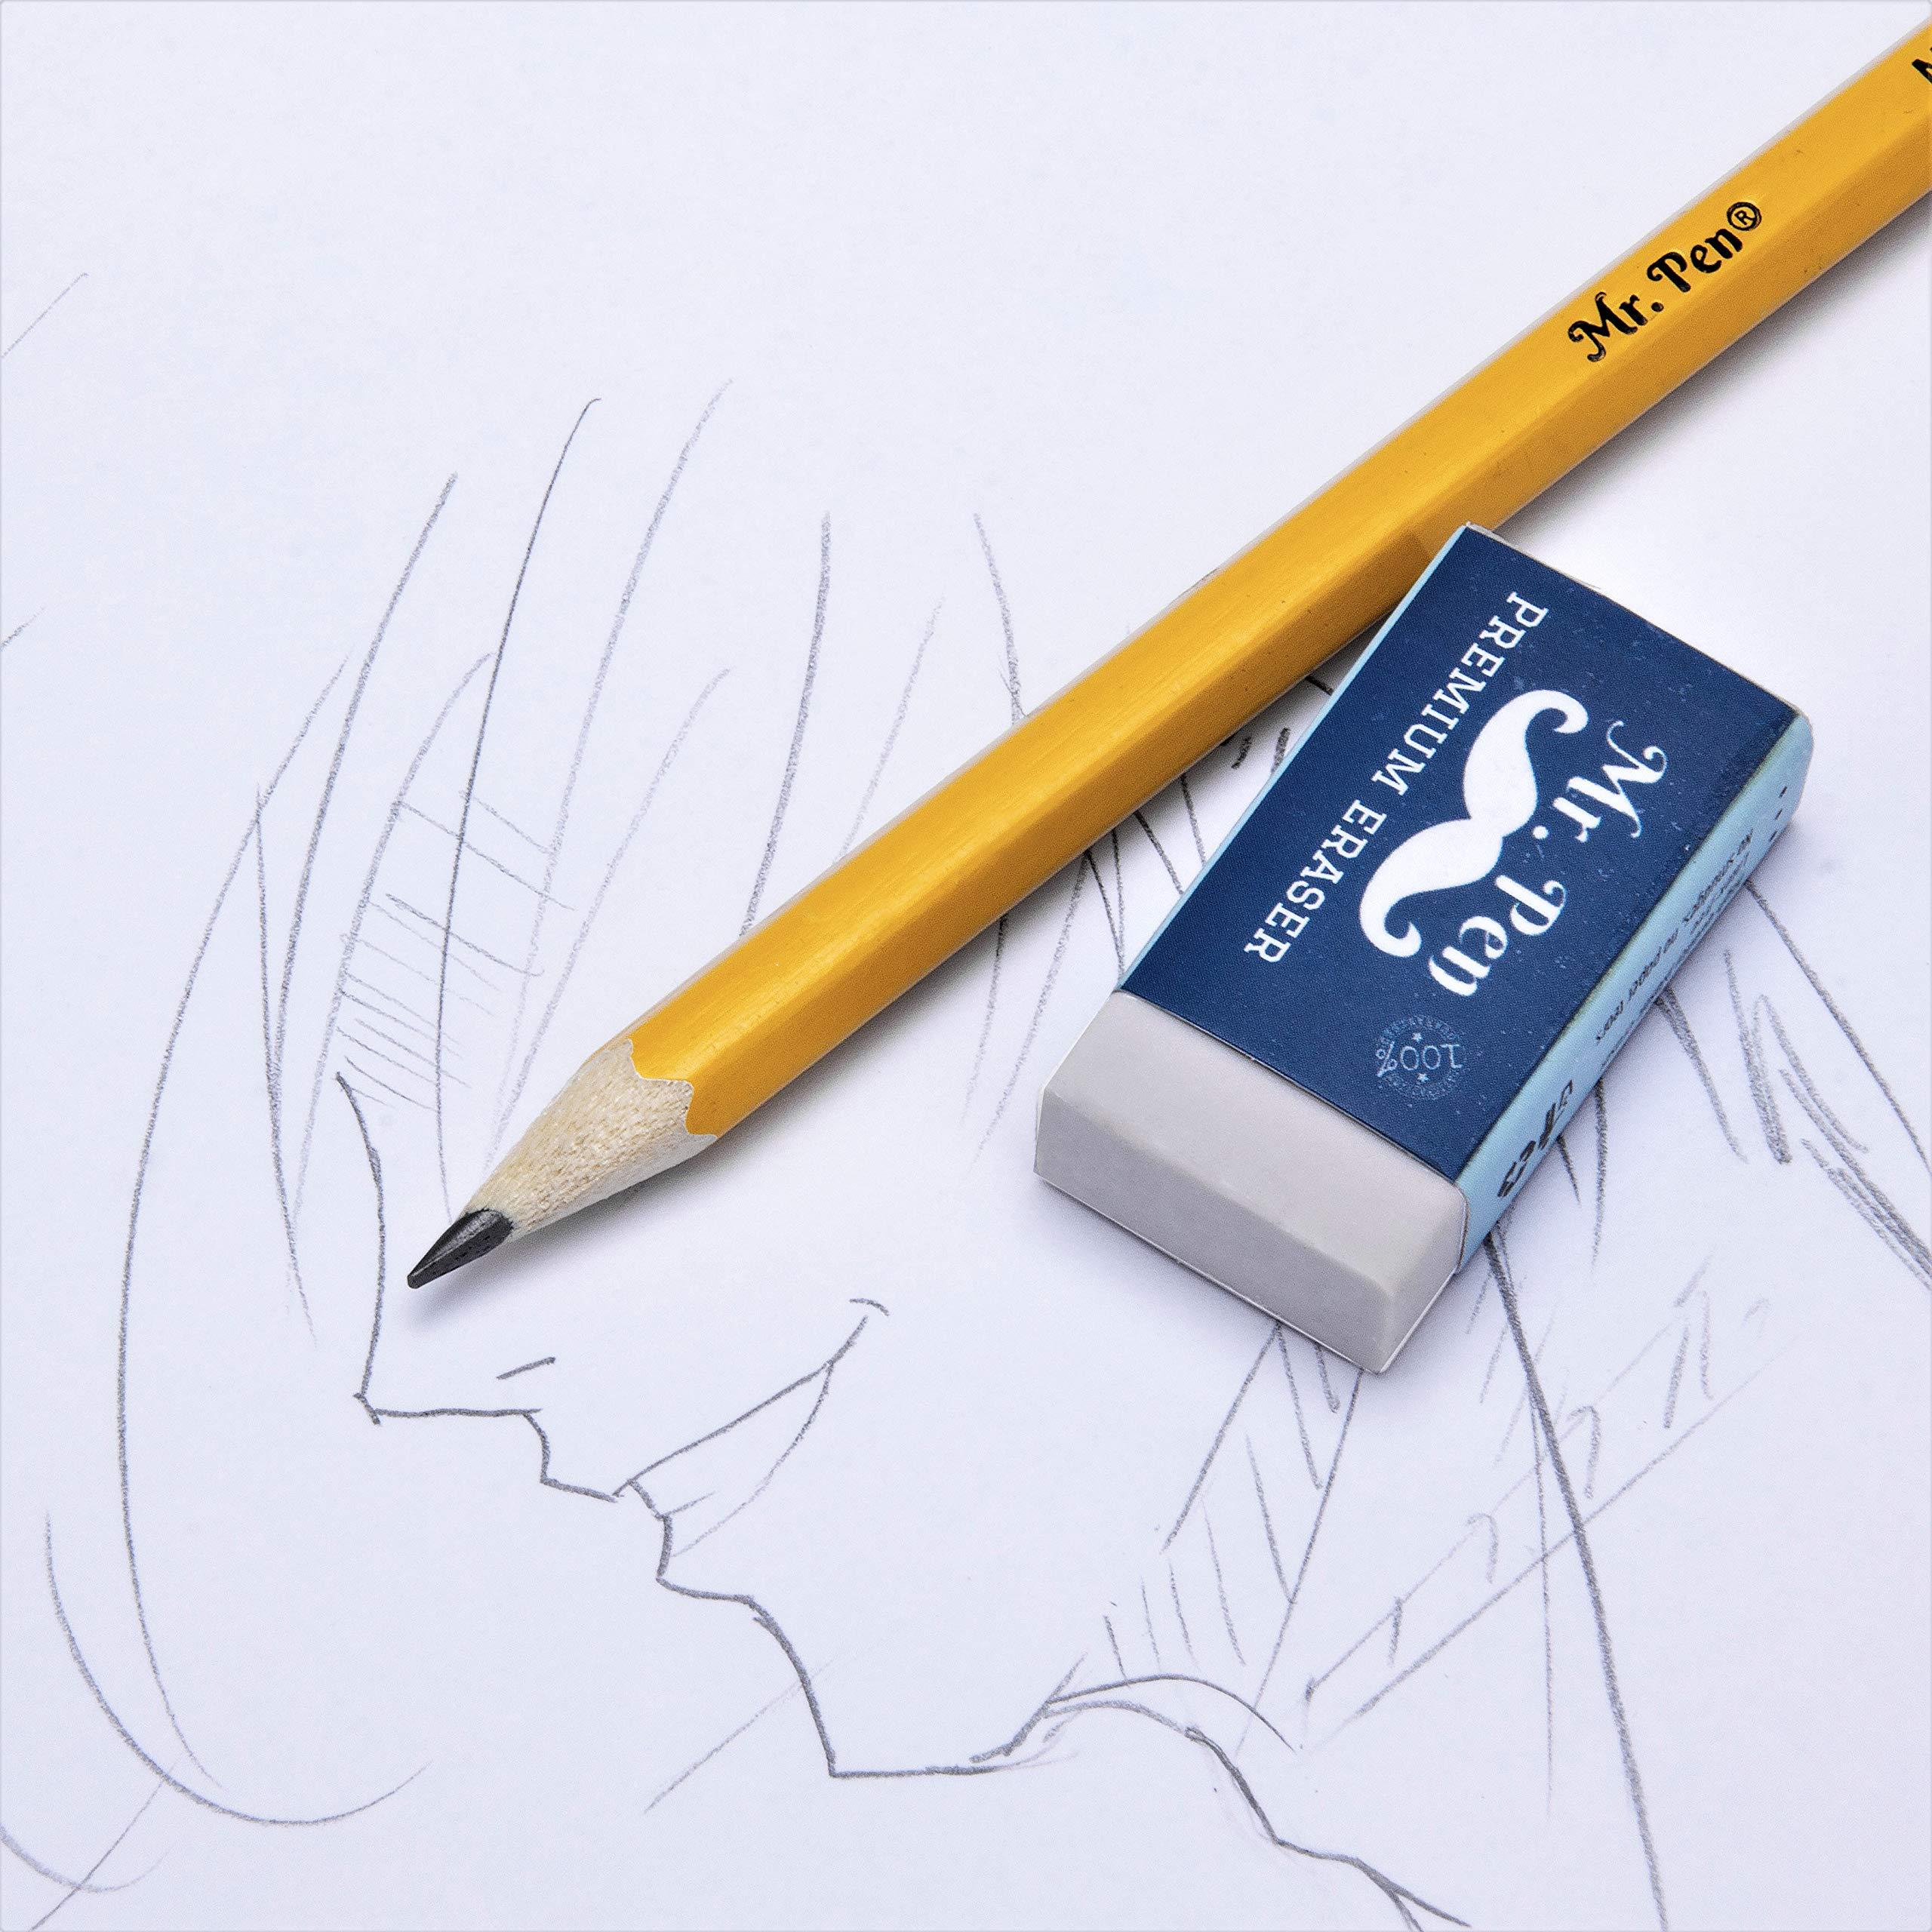 Mr. Pen- Erasers, Pack of 24, Premium Eraser, Pencil Erasers, White Eraser, School Supplies, Eraser Pencil for Artists and Students, Erasers for Kids, Art Eraser, Erasers Bulk, Eraser for School by Mr. Pen (Image #4)